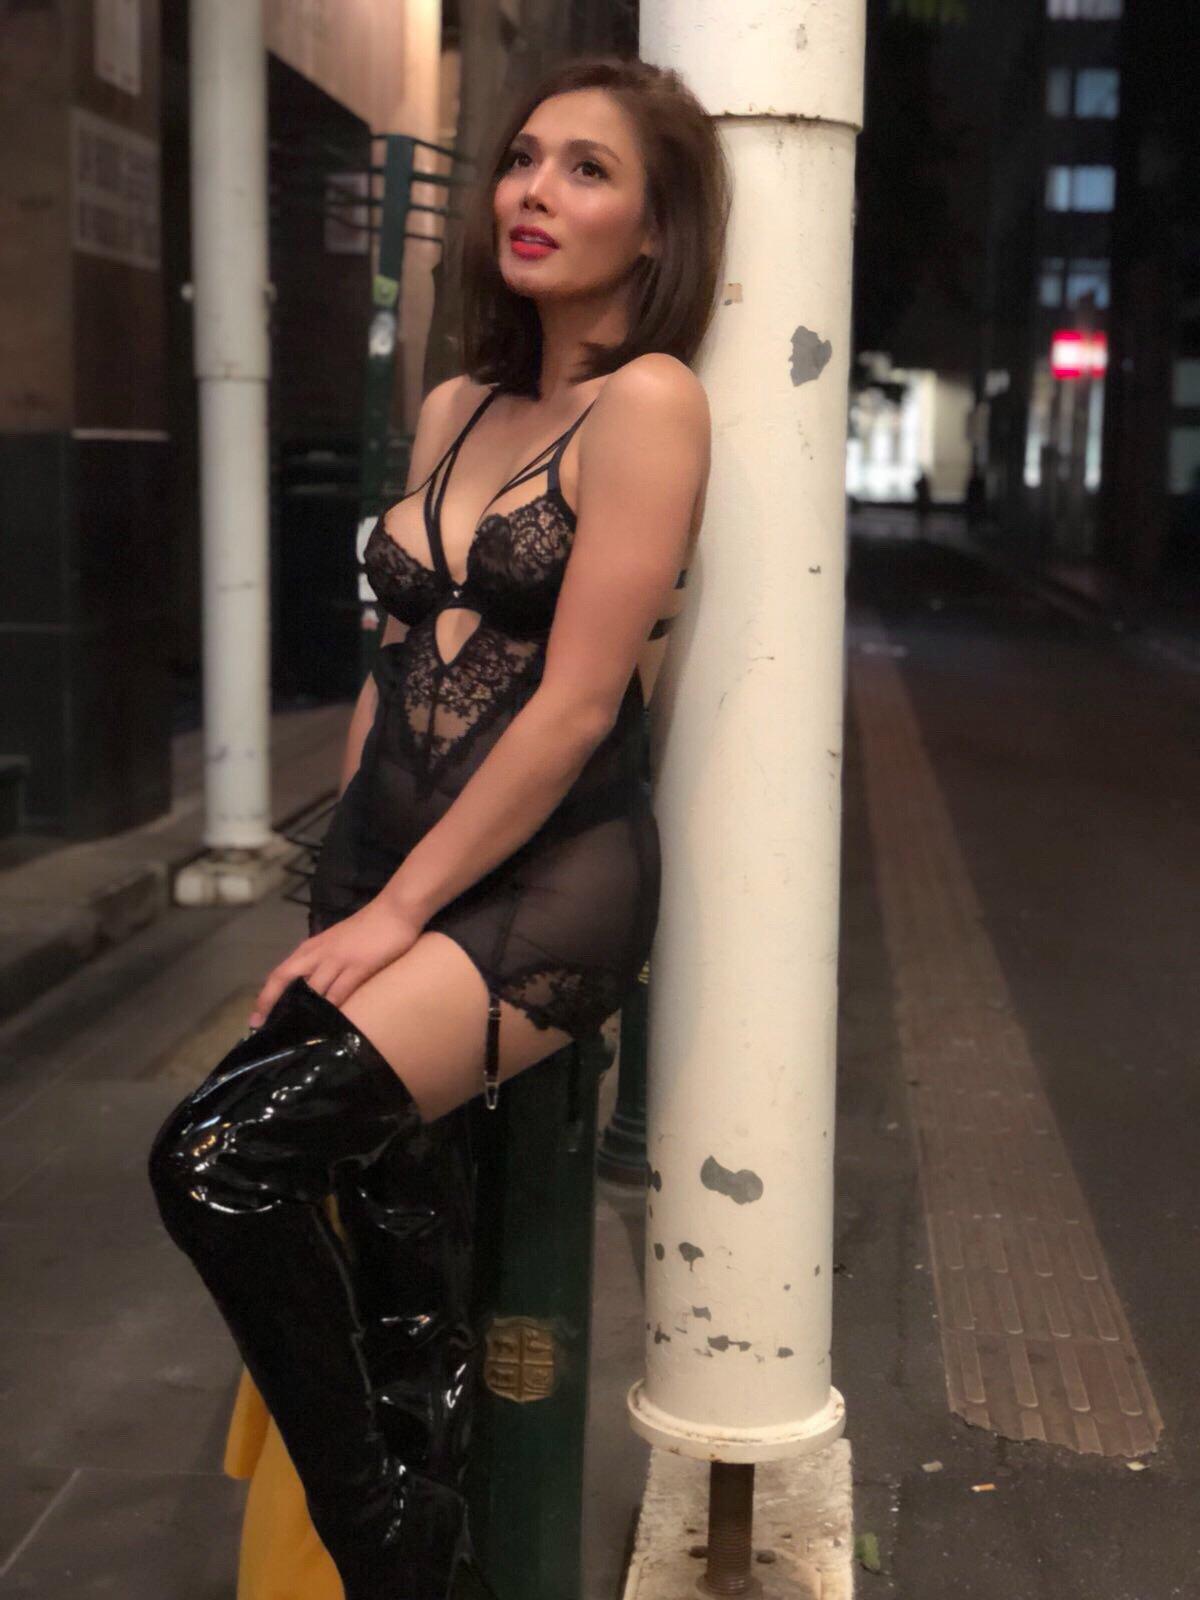 Girls in Melbourne